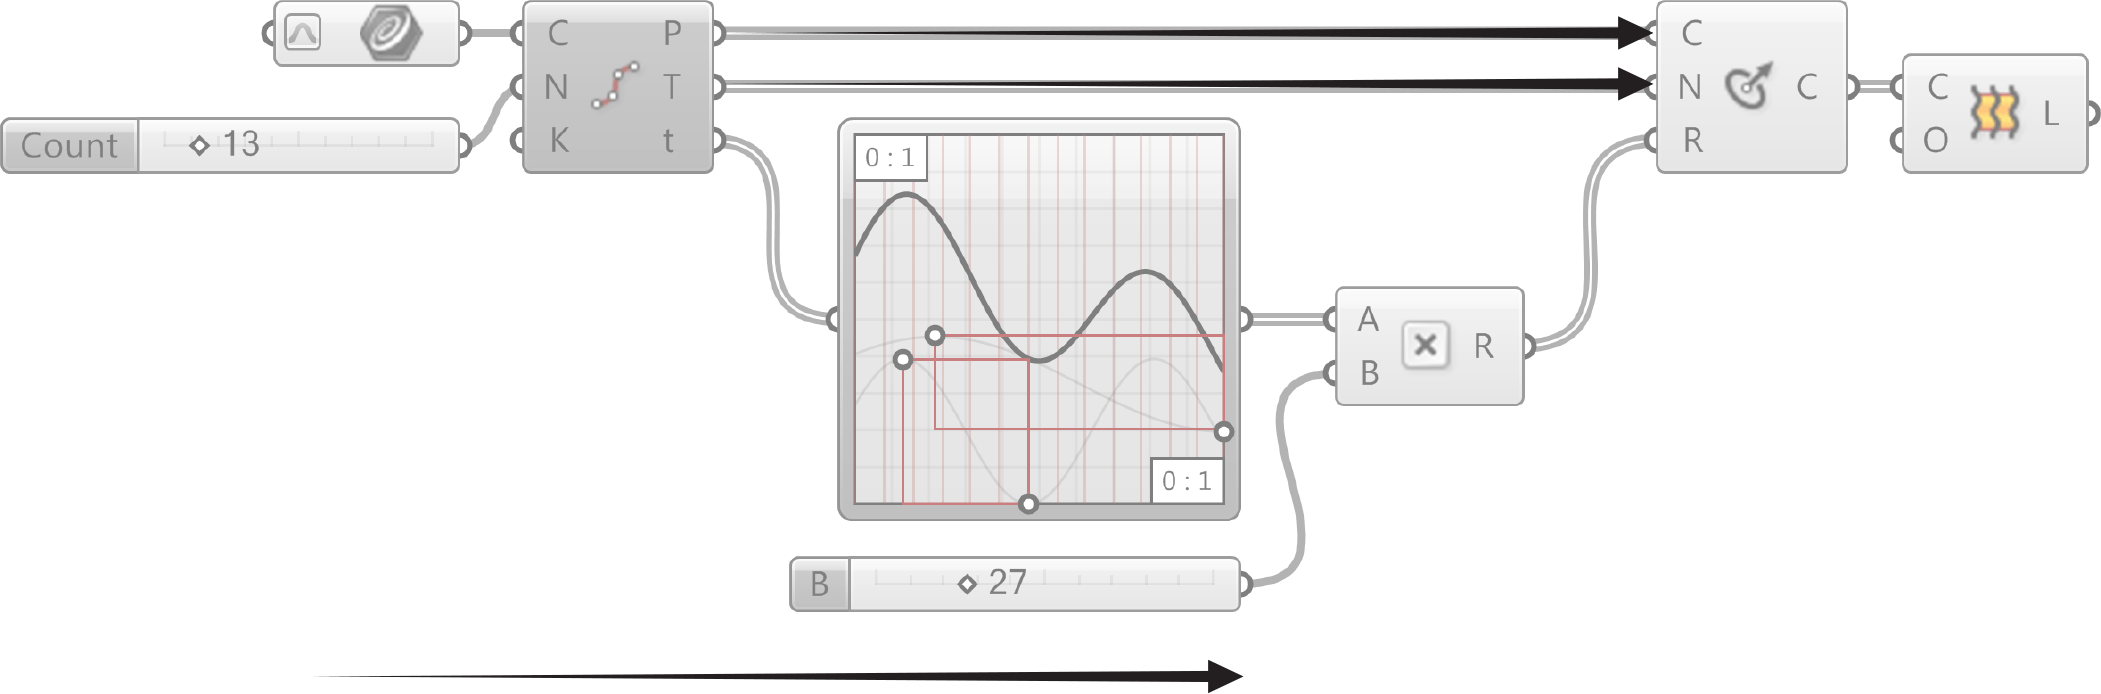 Mf12 Ignition Switch Auto Electrical Wiring Diagram Grasshopper Schematic